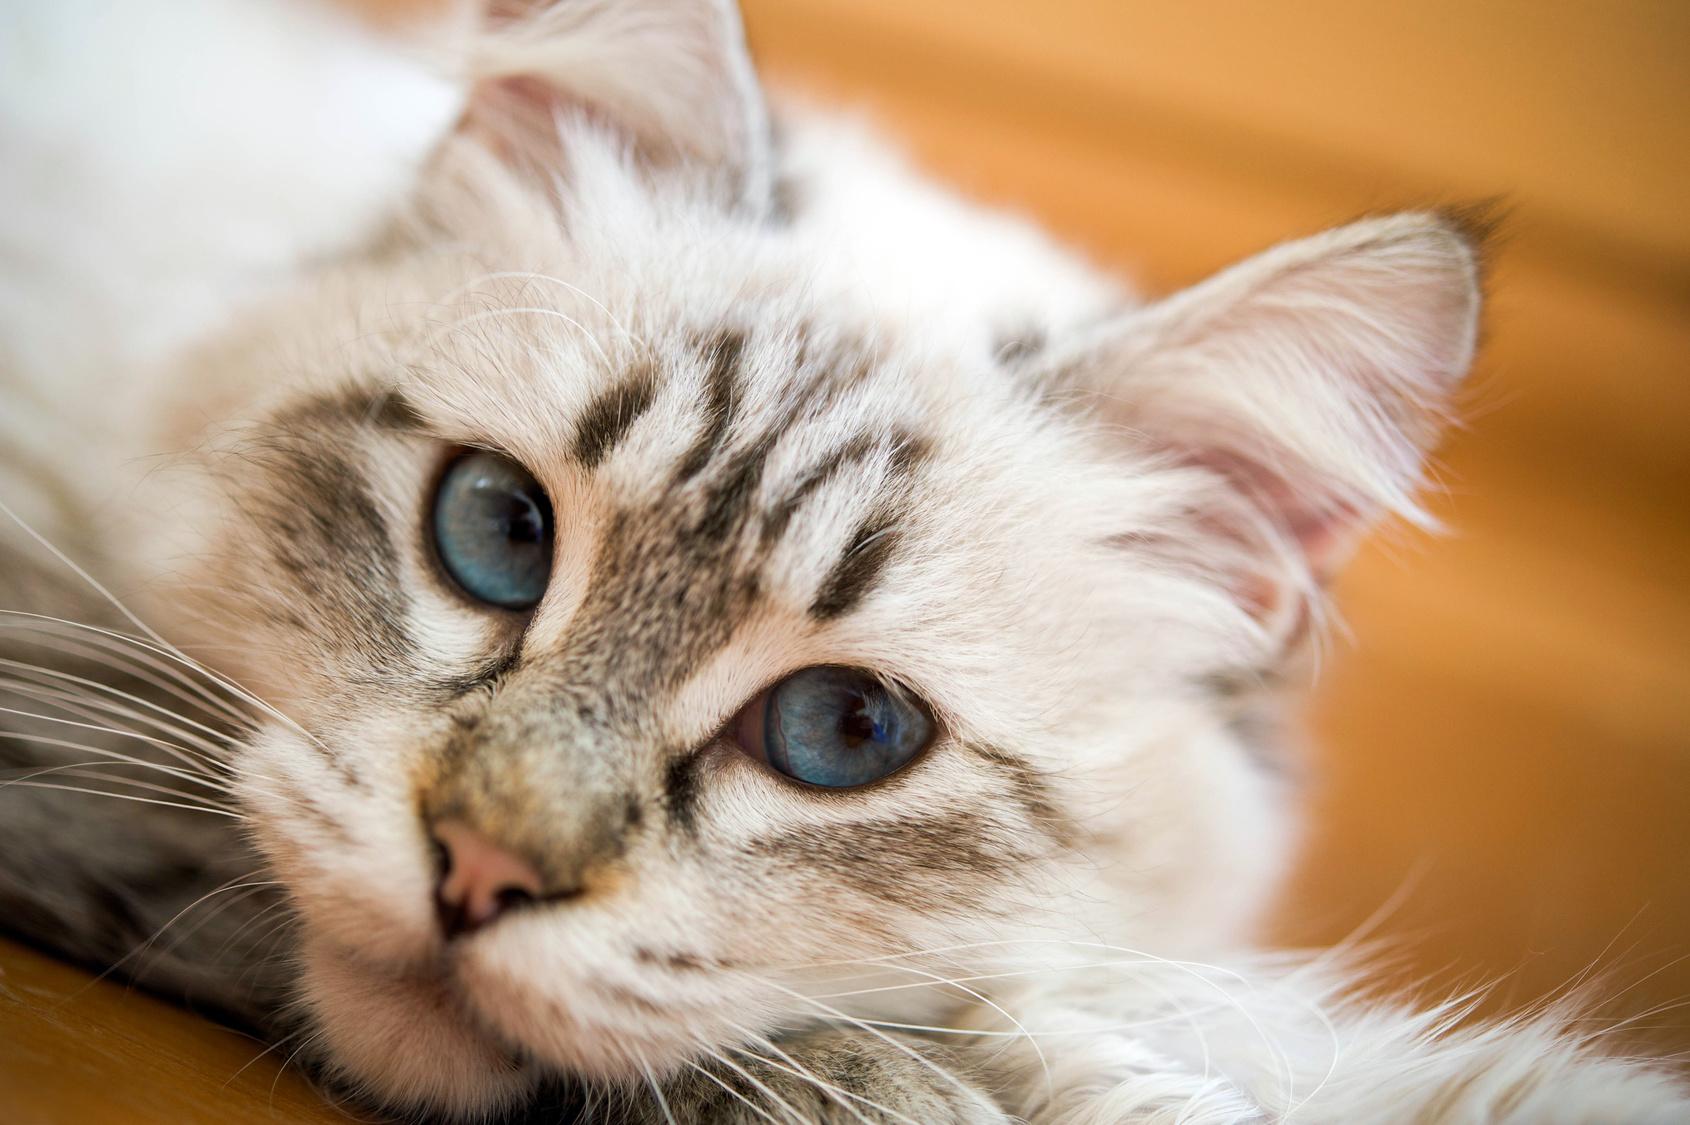 Katze Bild: Katze Rollig Trotz Kastration Homoopathie